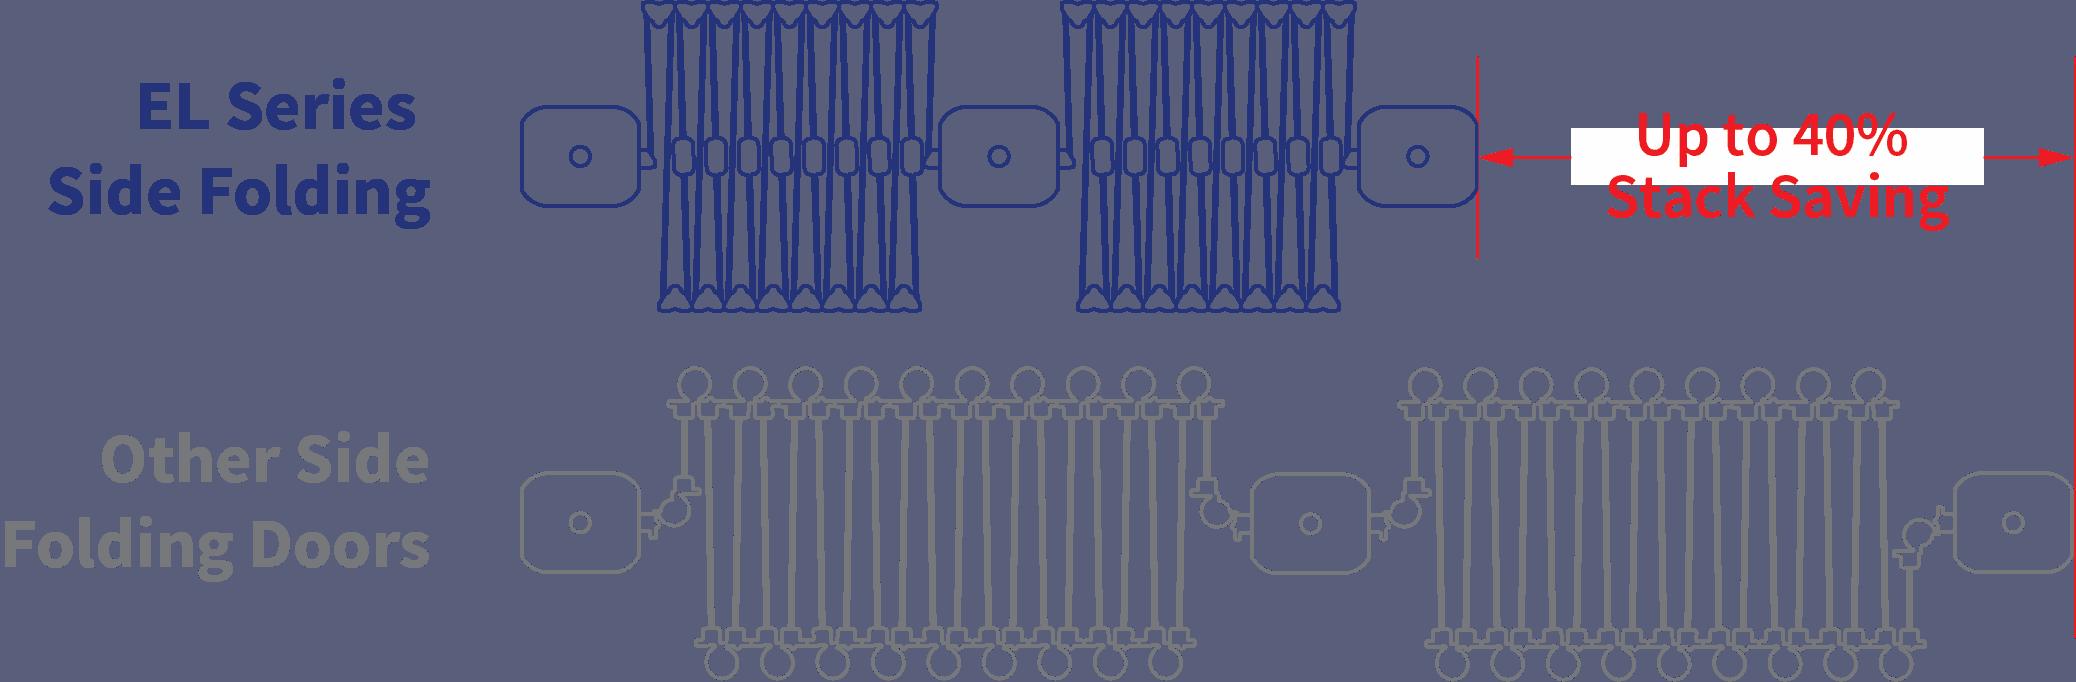 New elite door stack comparison illustration